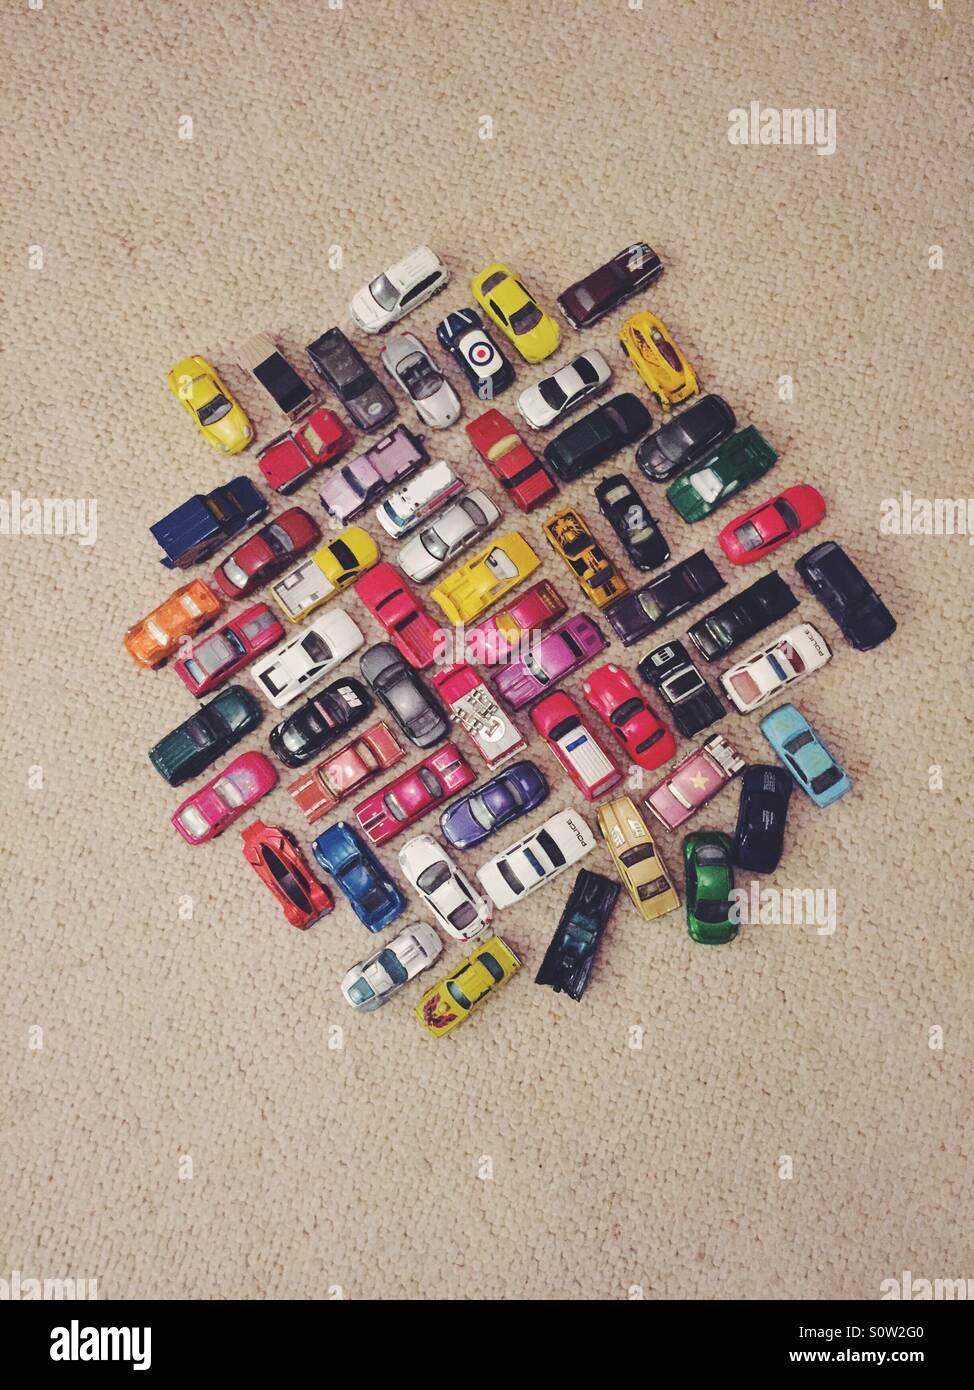 Traffic jam on the carpet. Stock Photo